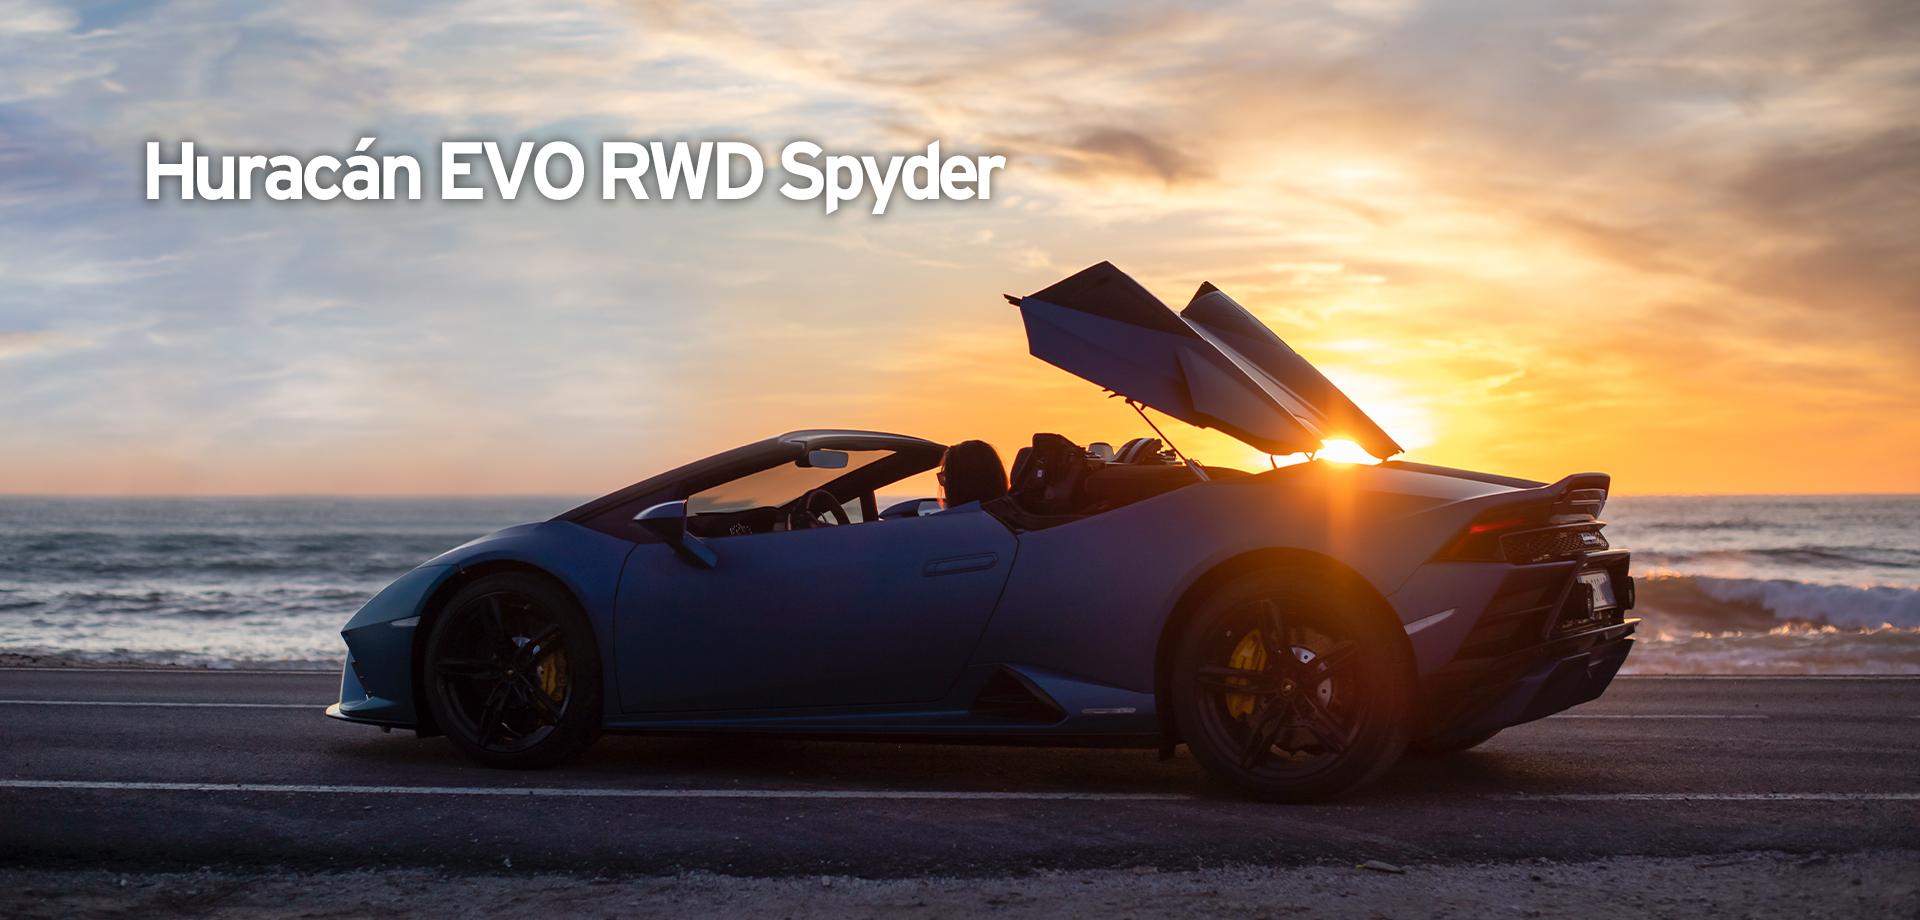 Huracan EVO RWD Spyder